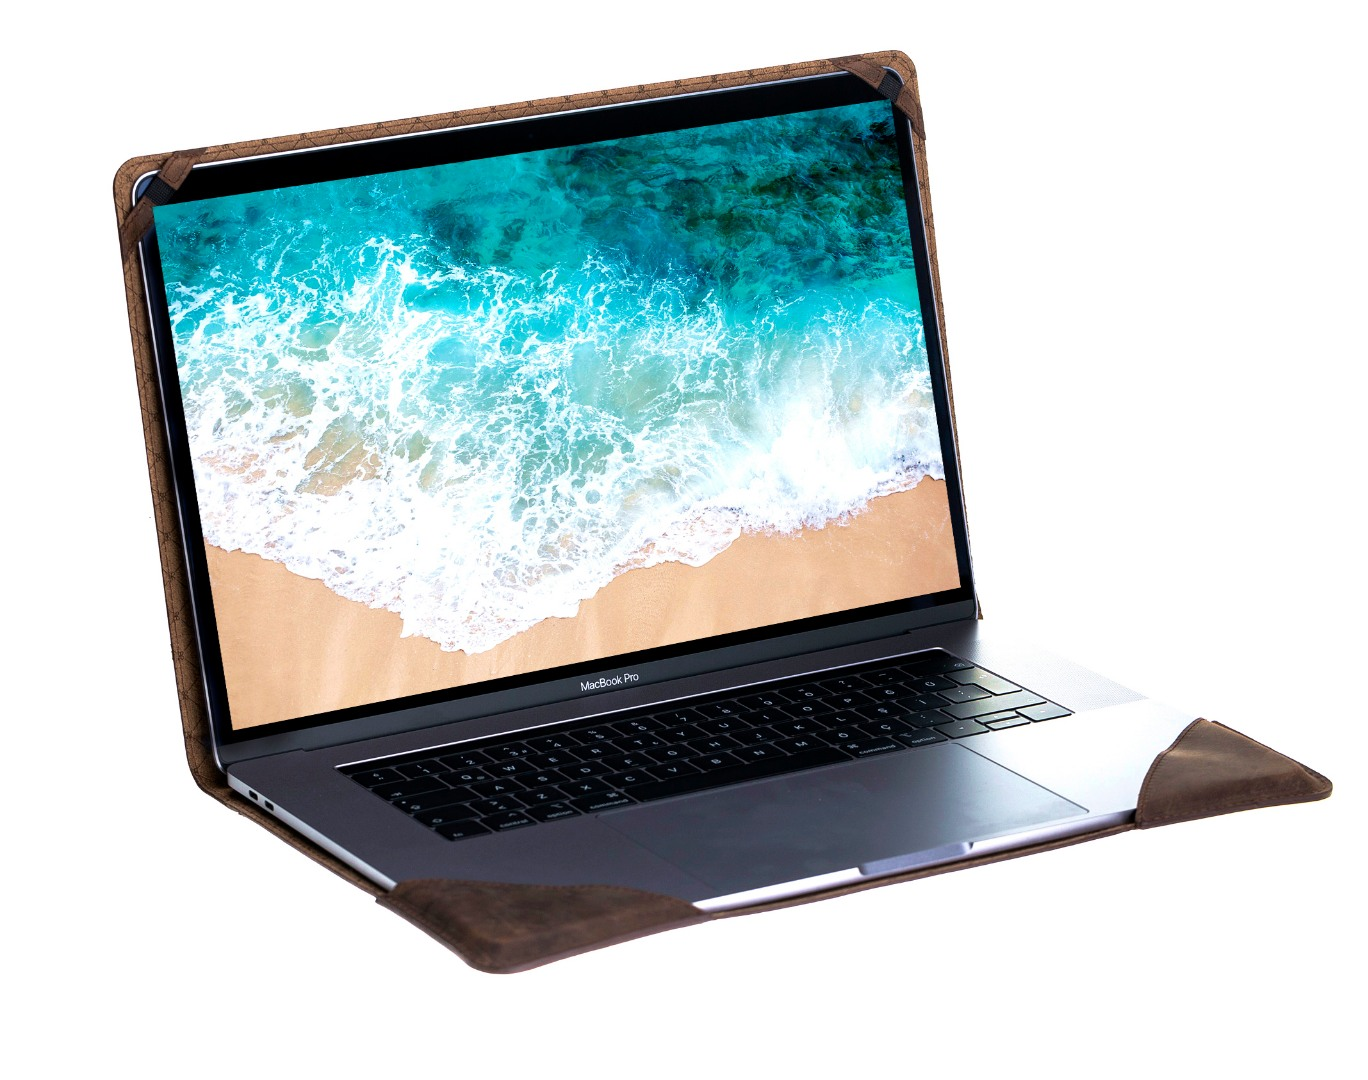 Husa slim soft cover piele naturala premium, MacBook Pro 13 inch (2016 - 2020) Bouletta, Antique coffee